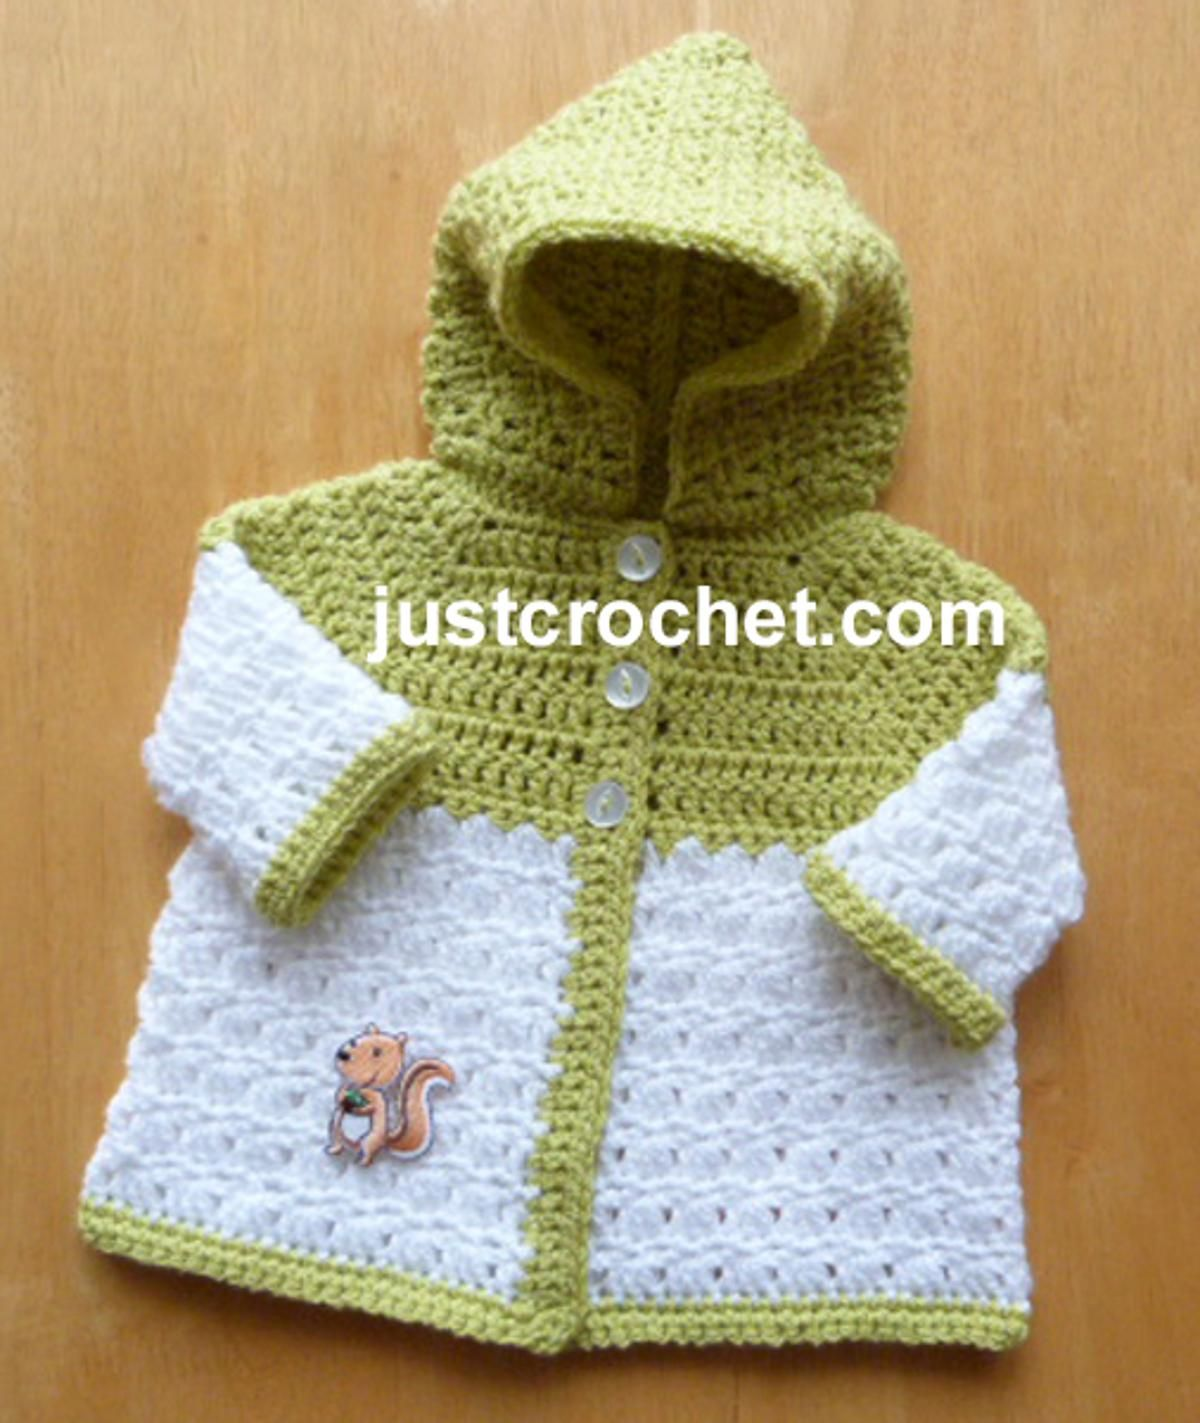 fjc124-Newborn Hooded Coat Baby Crochet Pattern | Craftsy | Crochet ...